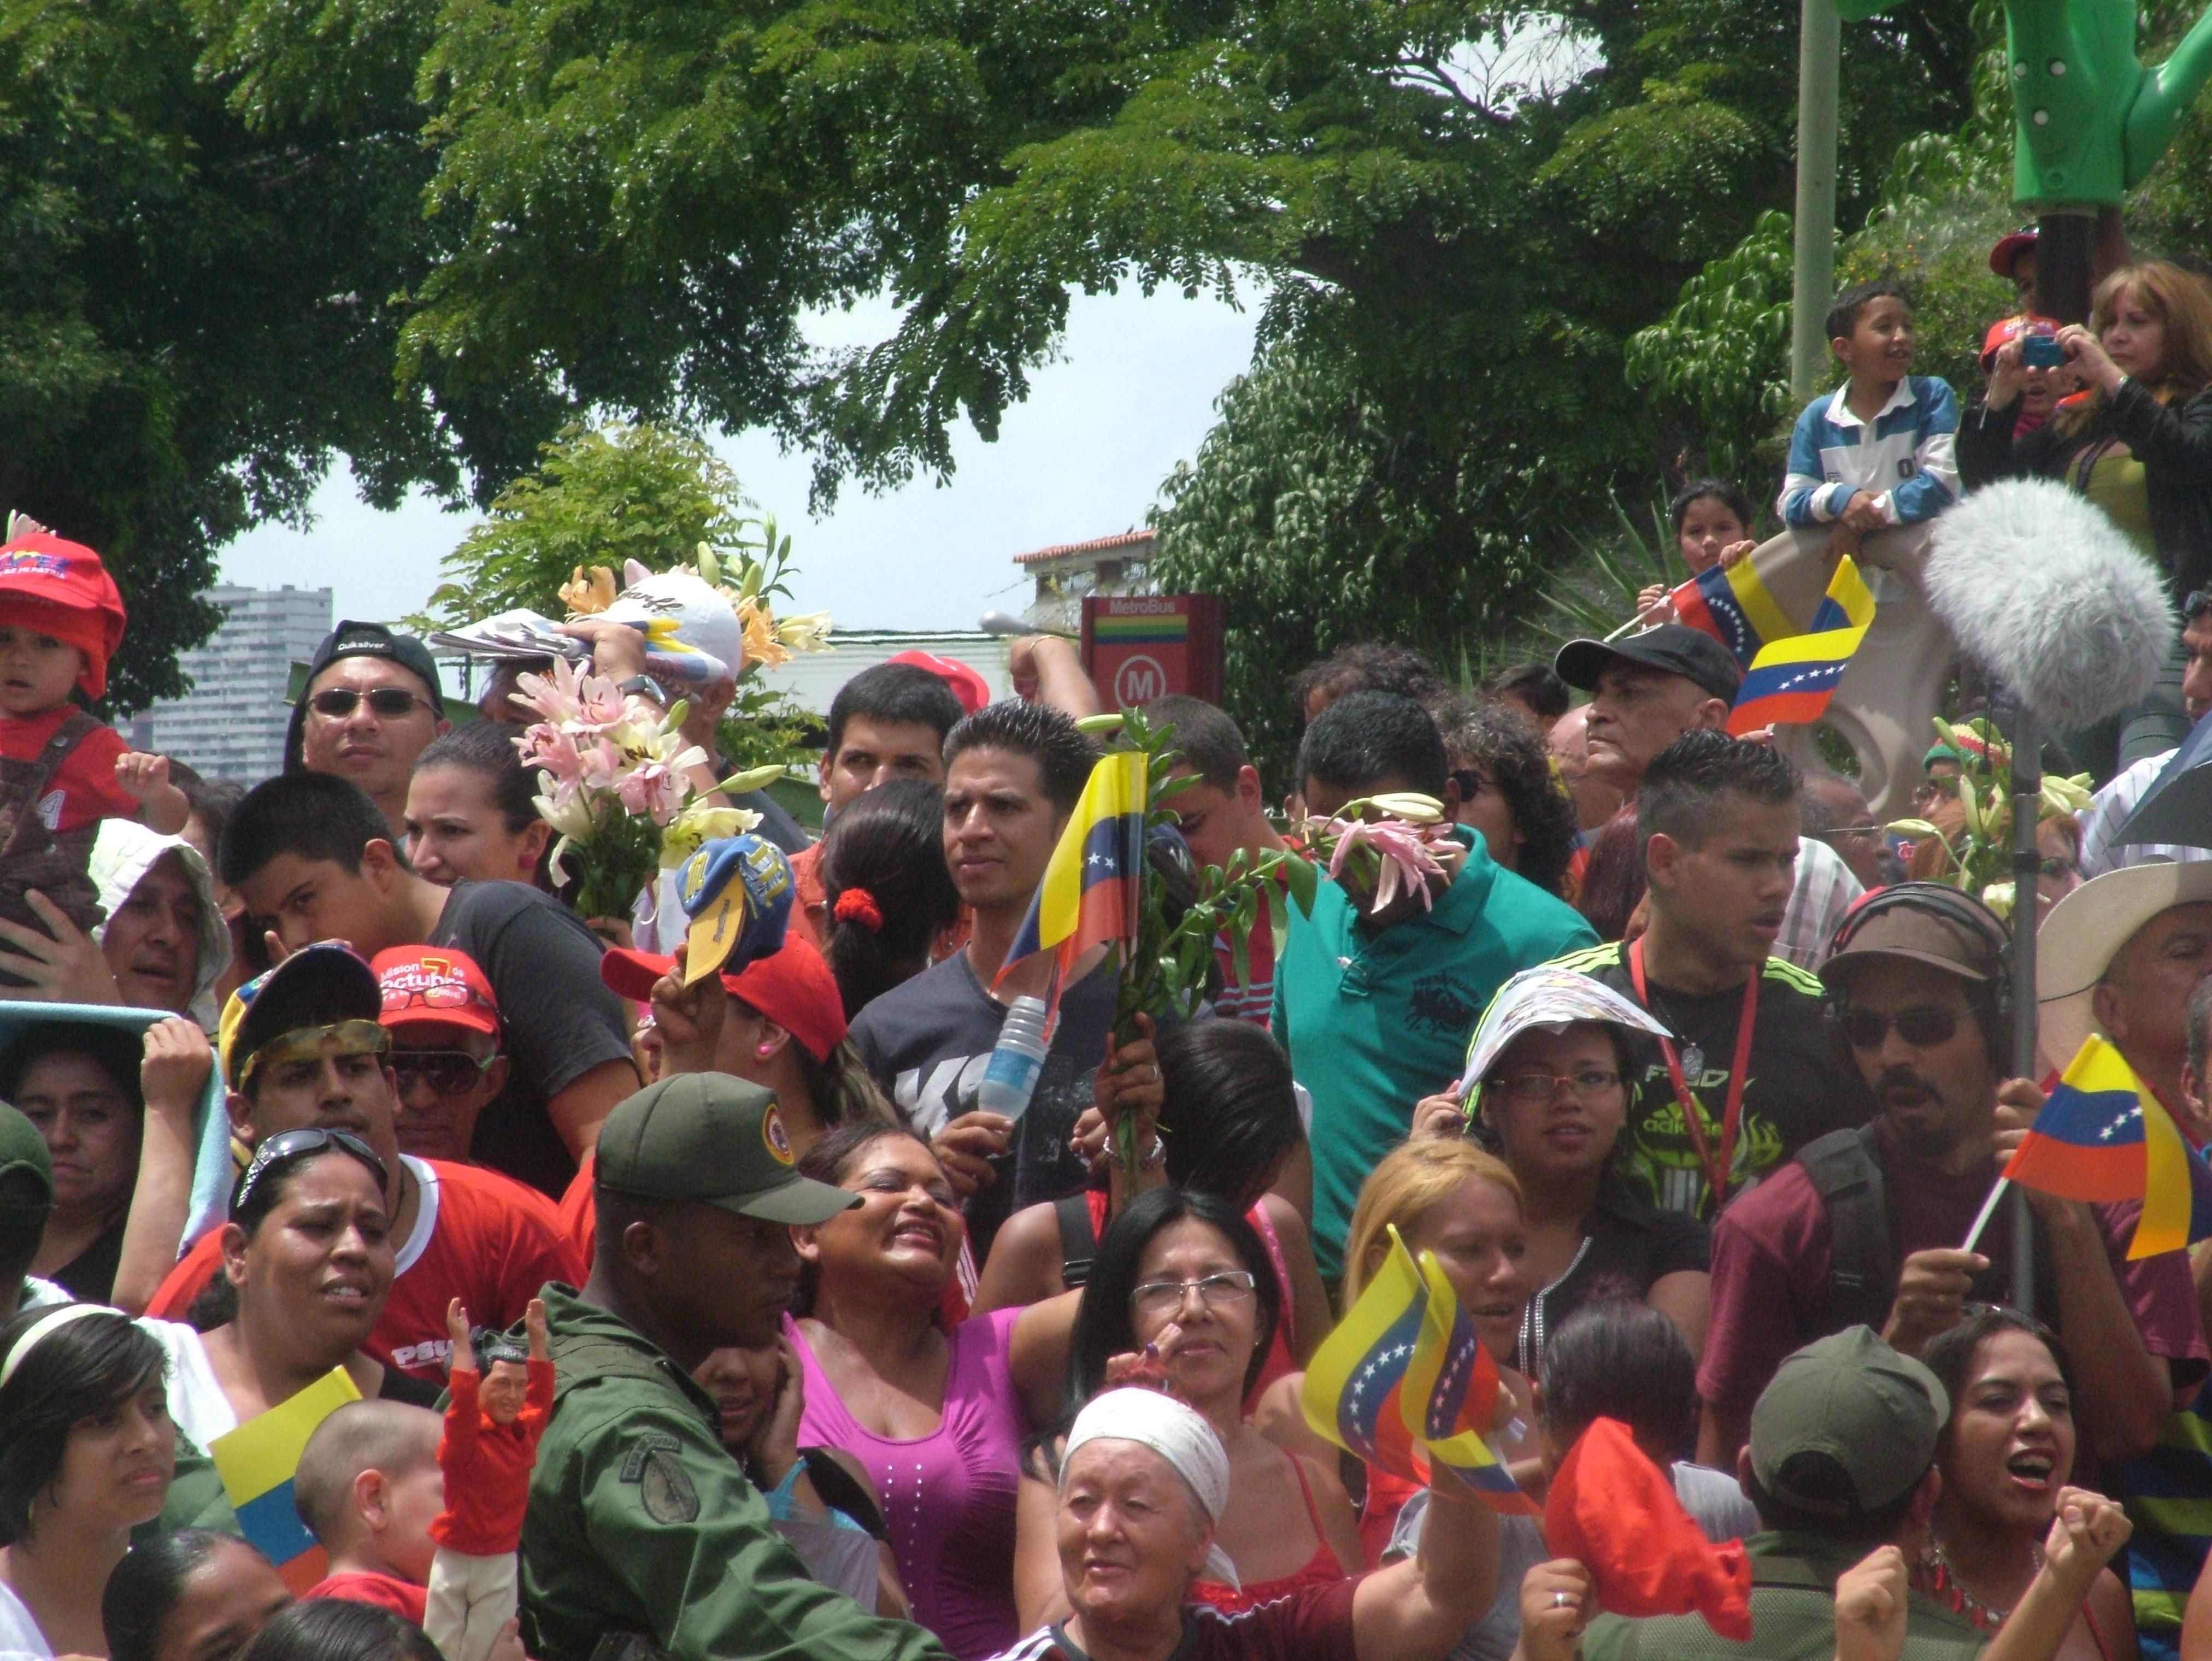 The Venezuelan People Vote Peacefully | Venezuelanalysis.com